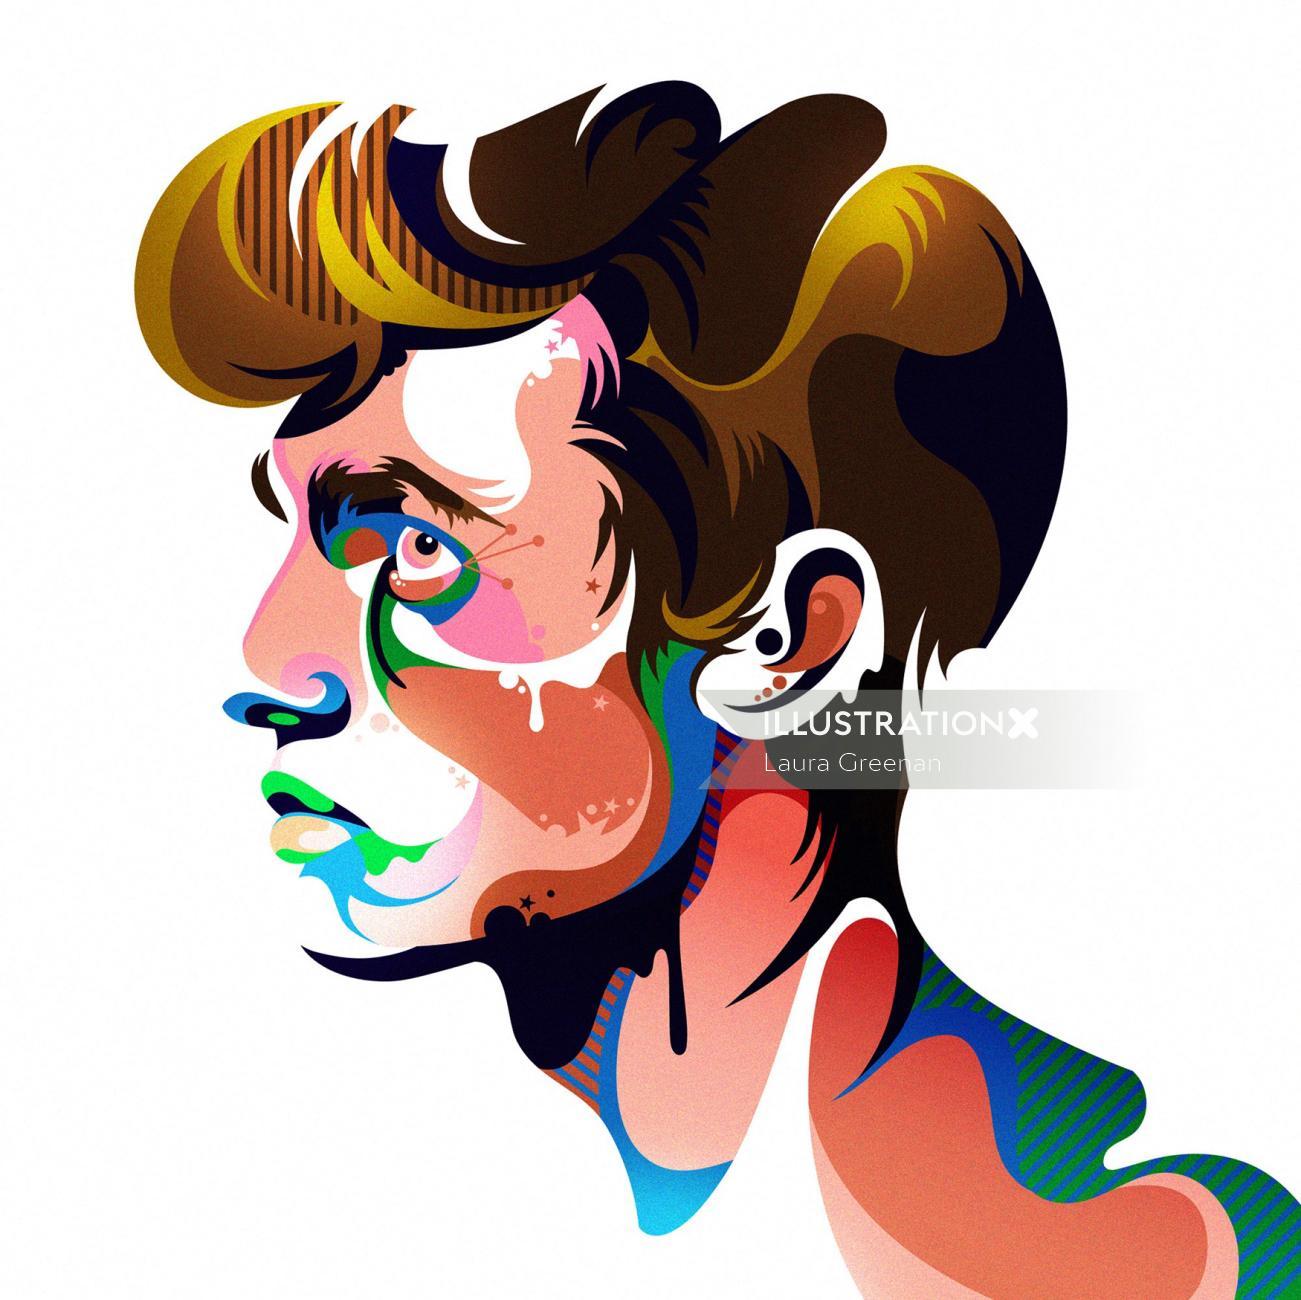 A colourful, imaginative, pop art style male portrait.